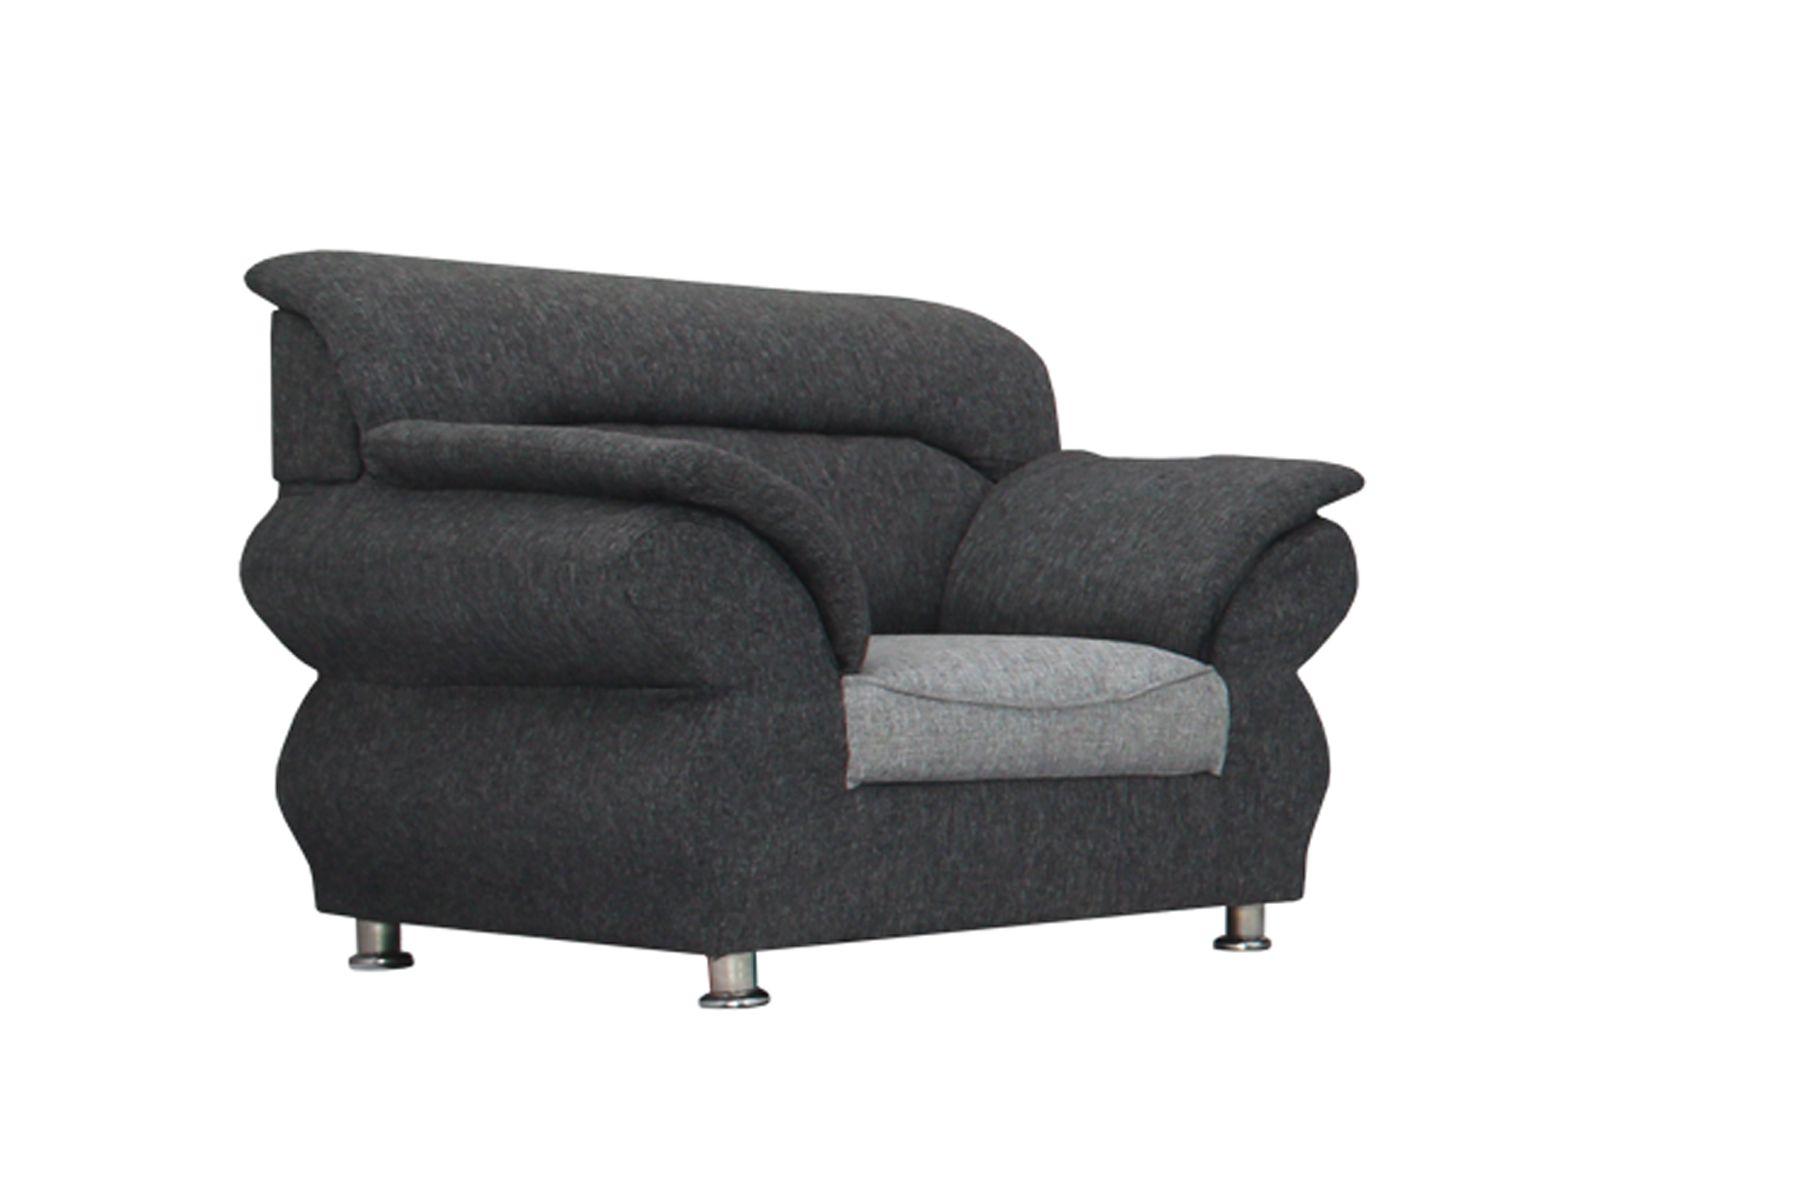 BLS Fabric Sofa Make your own Set Buy BLS Fabric Sofa Make your